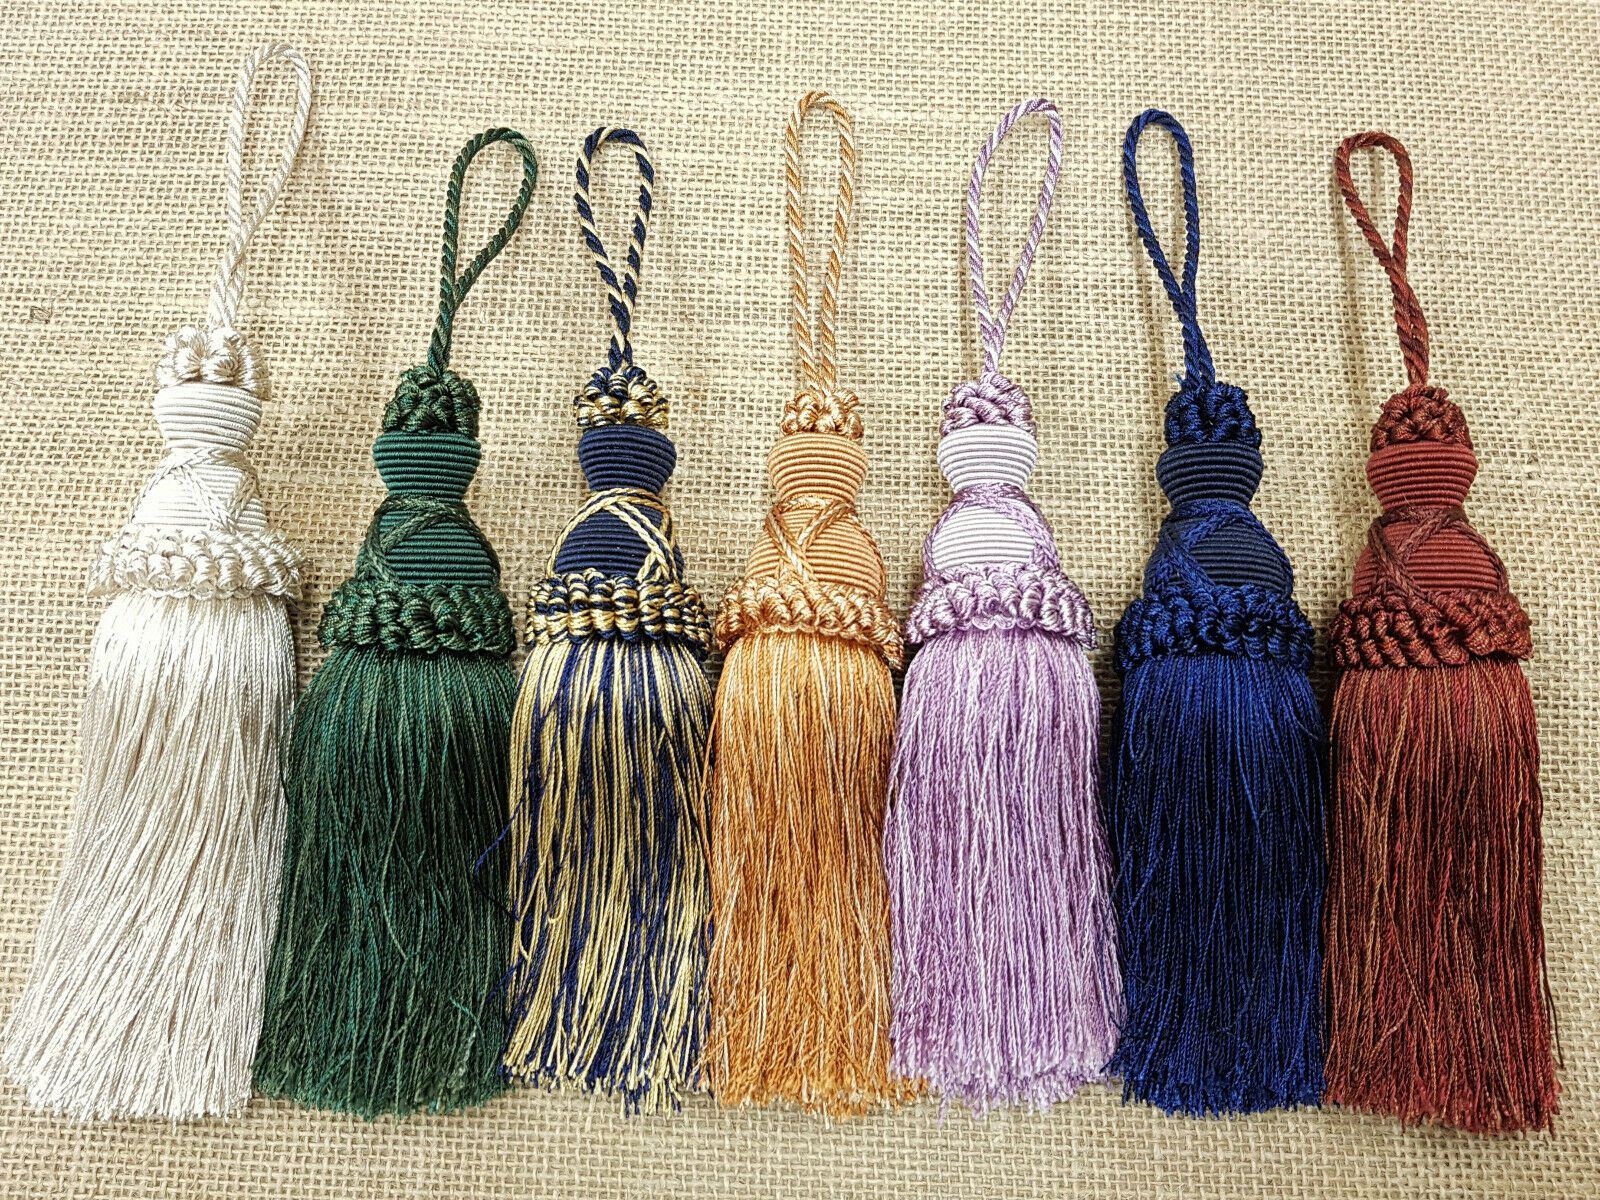 Decorative ribbon and bead curtain trim Luxury key tassel Door trimming 28cm